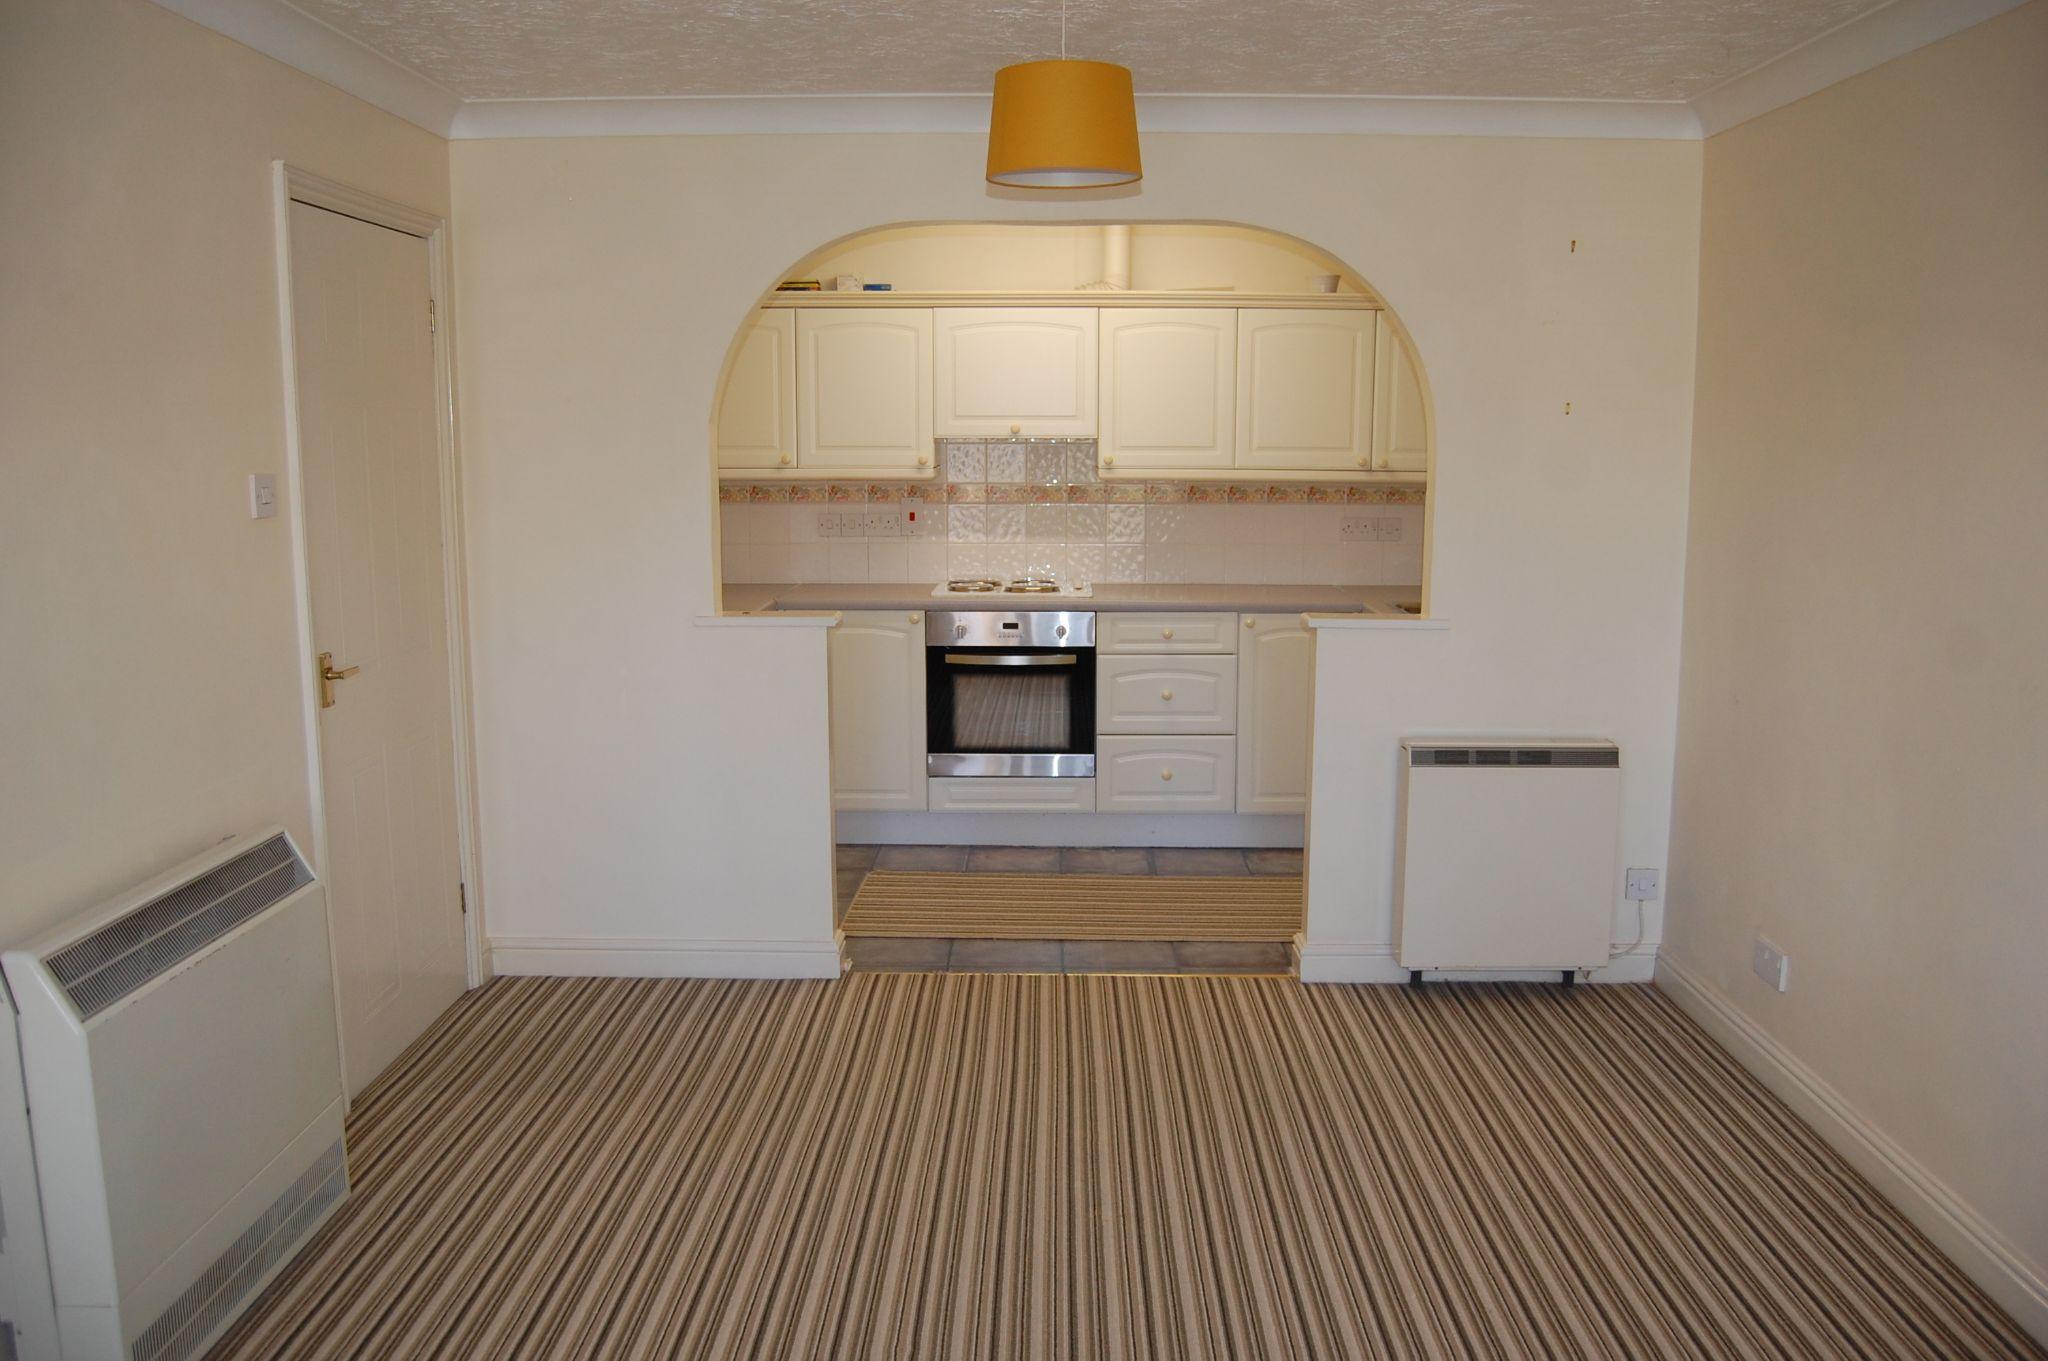 1 bedroom ground floor maisonette flat/apartment For Sale Alcester - Property photograph